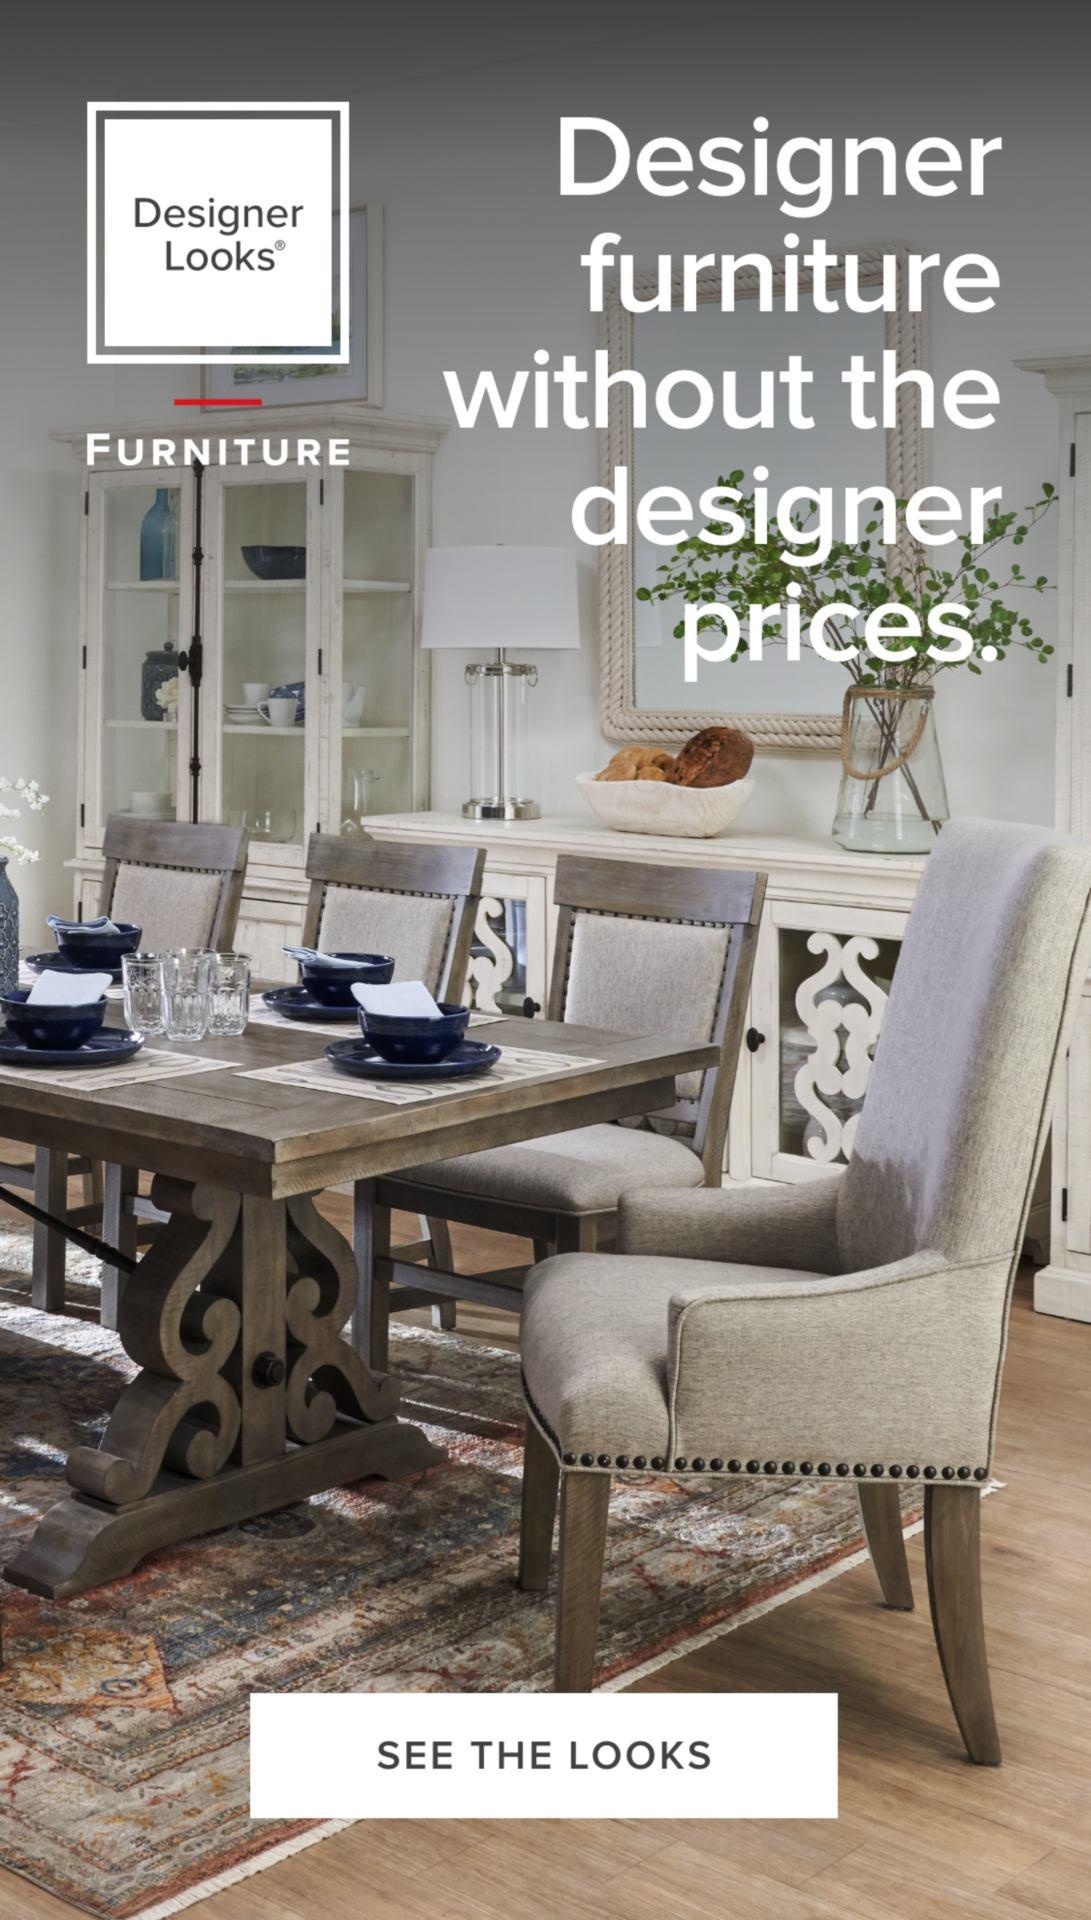 Designer dining room furniture without the designer prices.